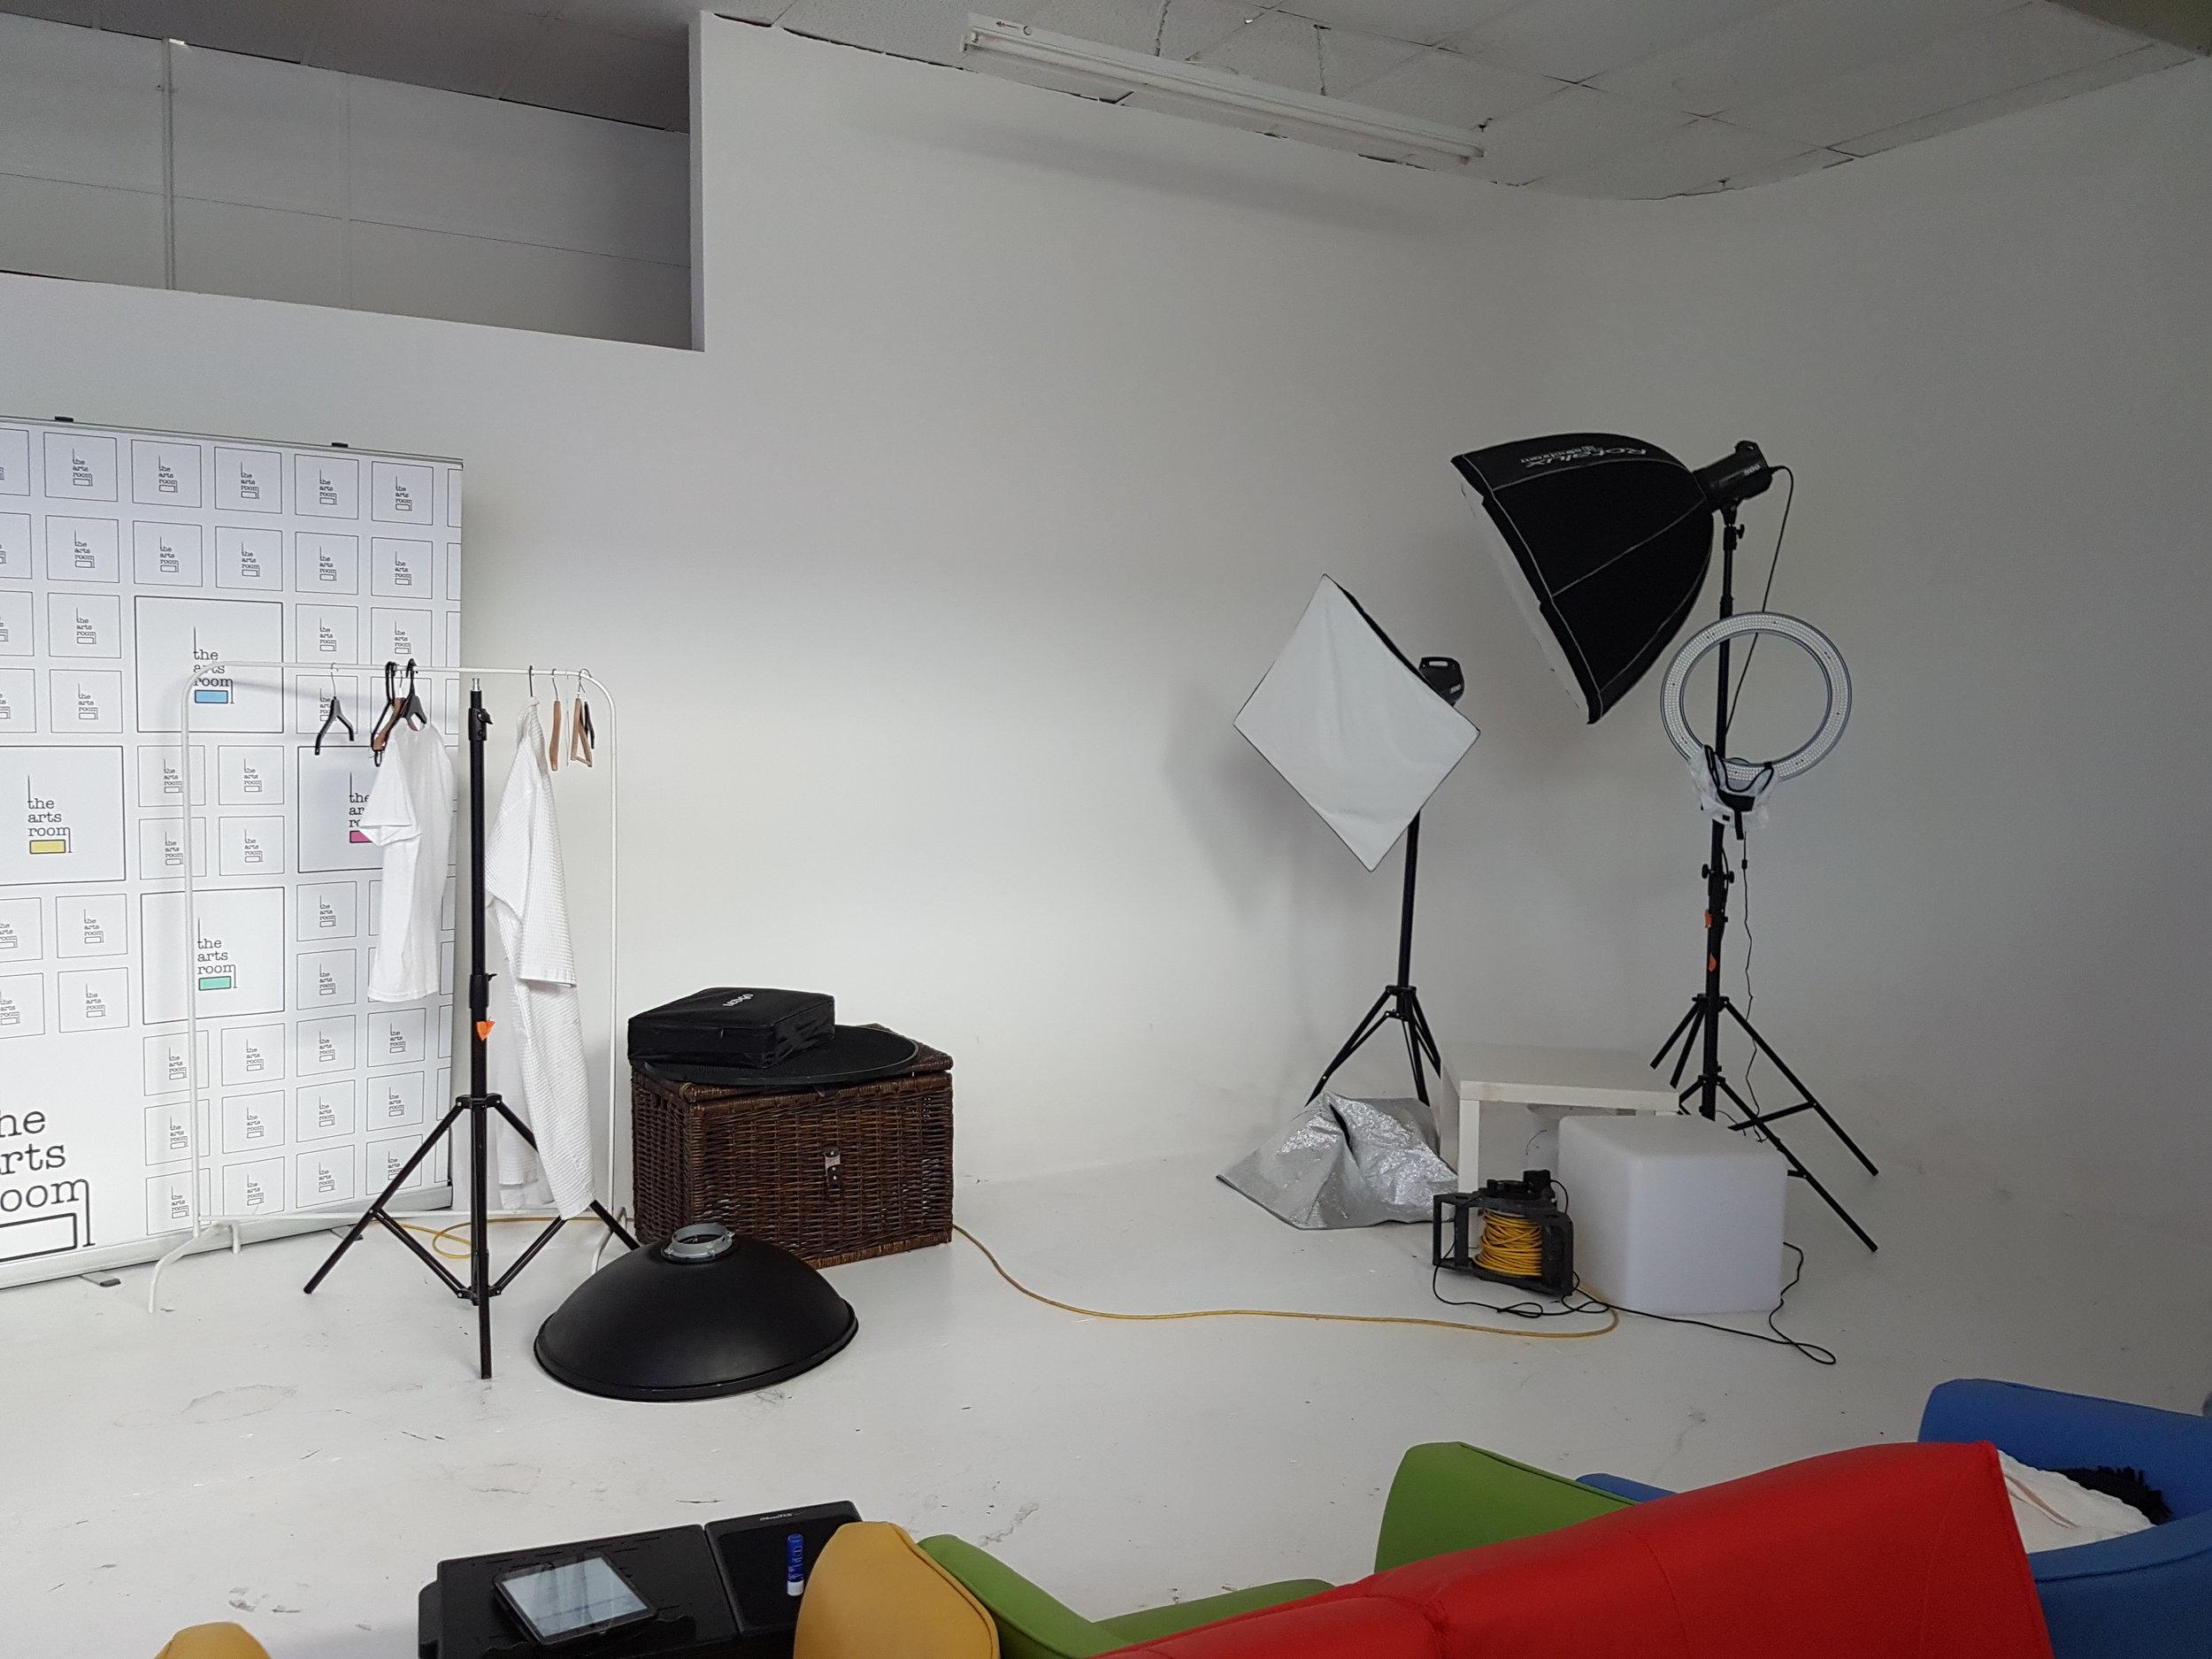 Where the Photographic magic happens...